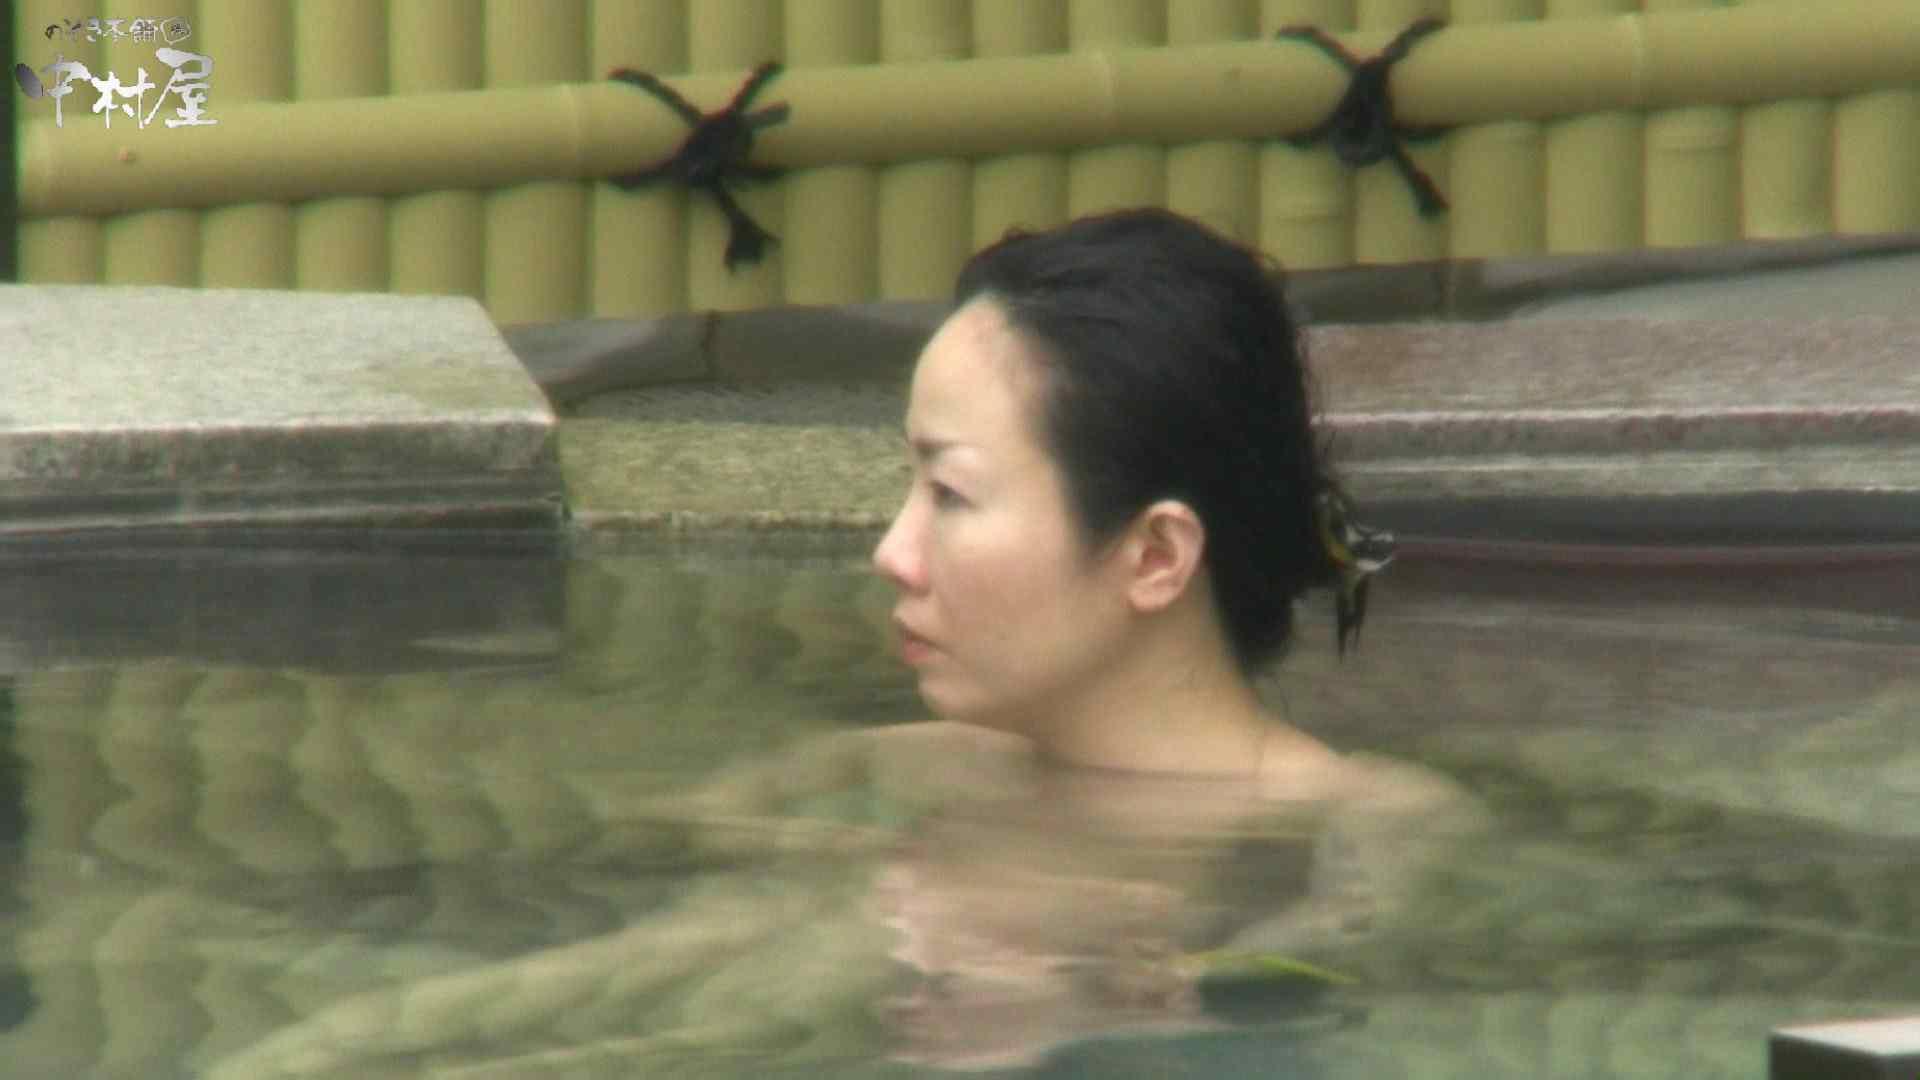 Aquaな露天風呂Vol.950 美しいOLの裸体 | 露天風呂突入  75pic 25